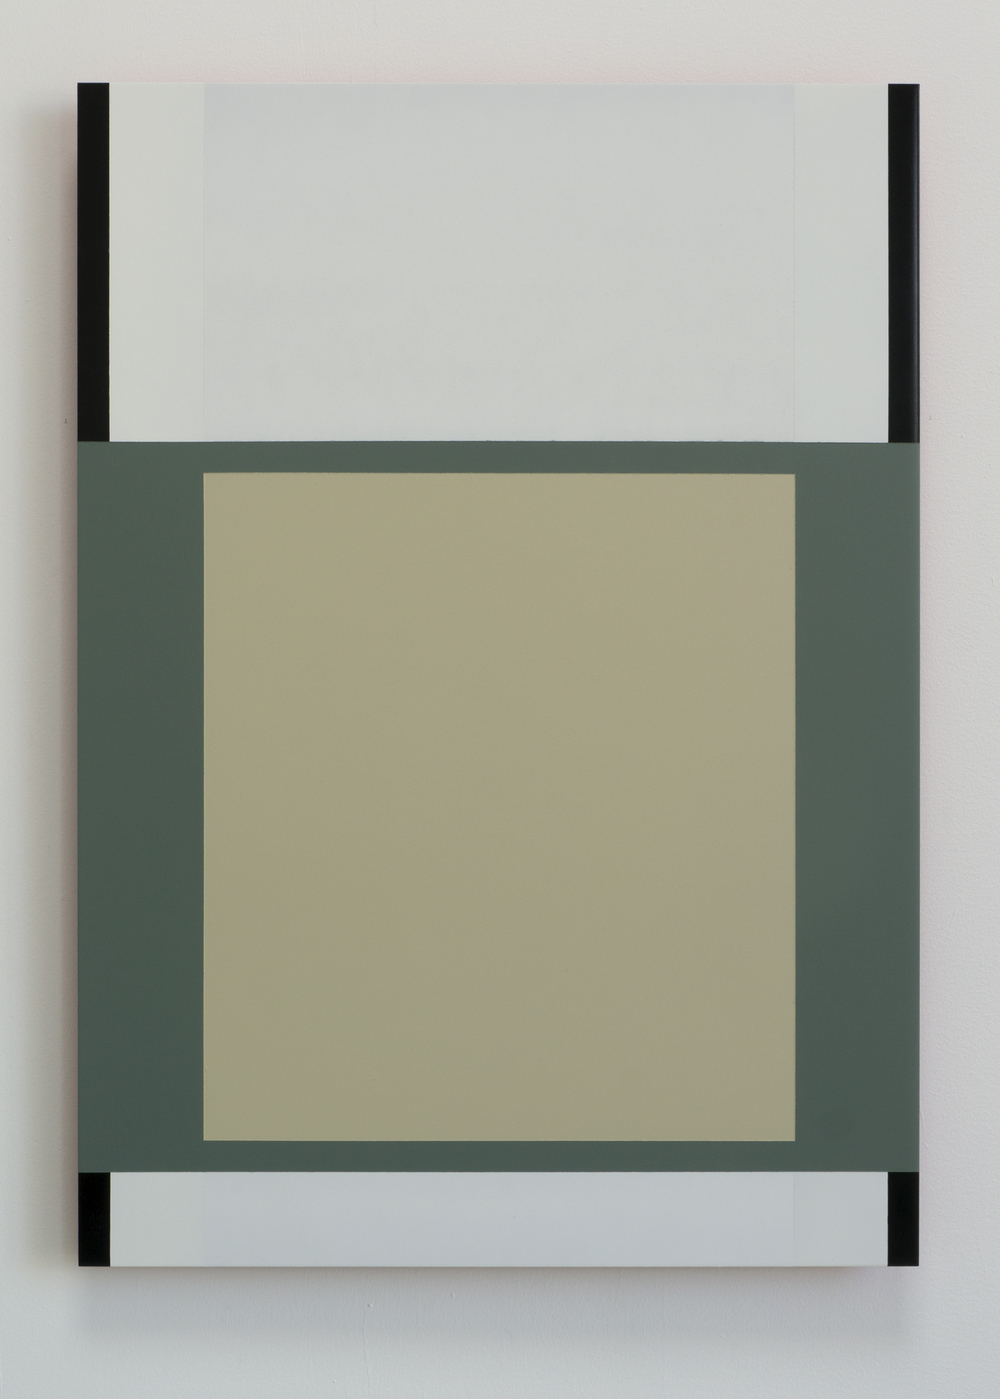 """Green Square""  2014  28"" x 20"",  spray paint on aluminum"